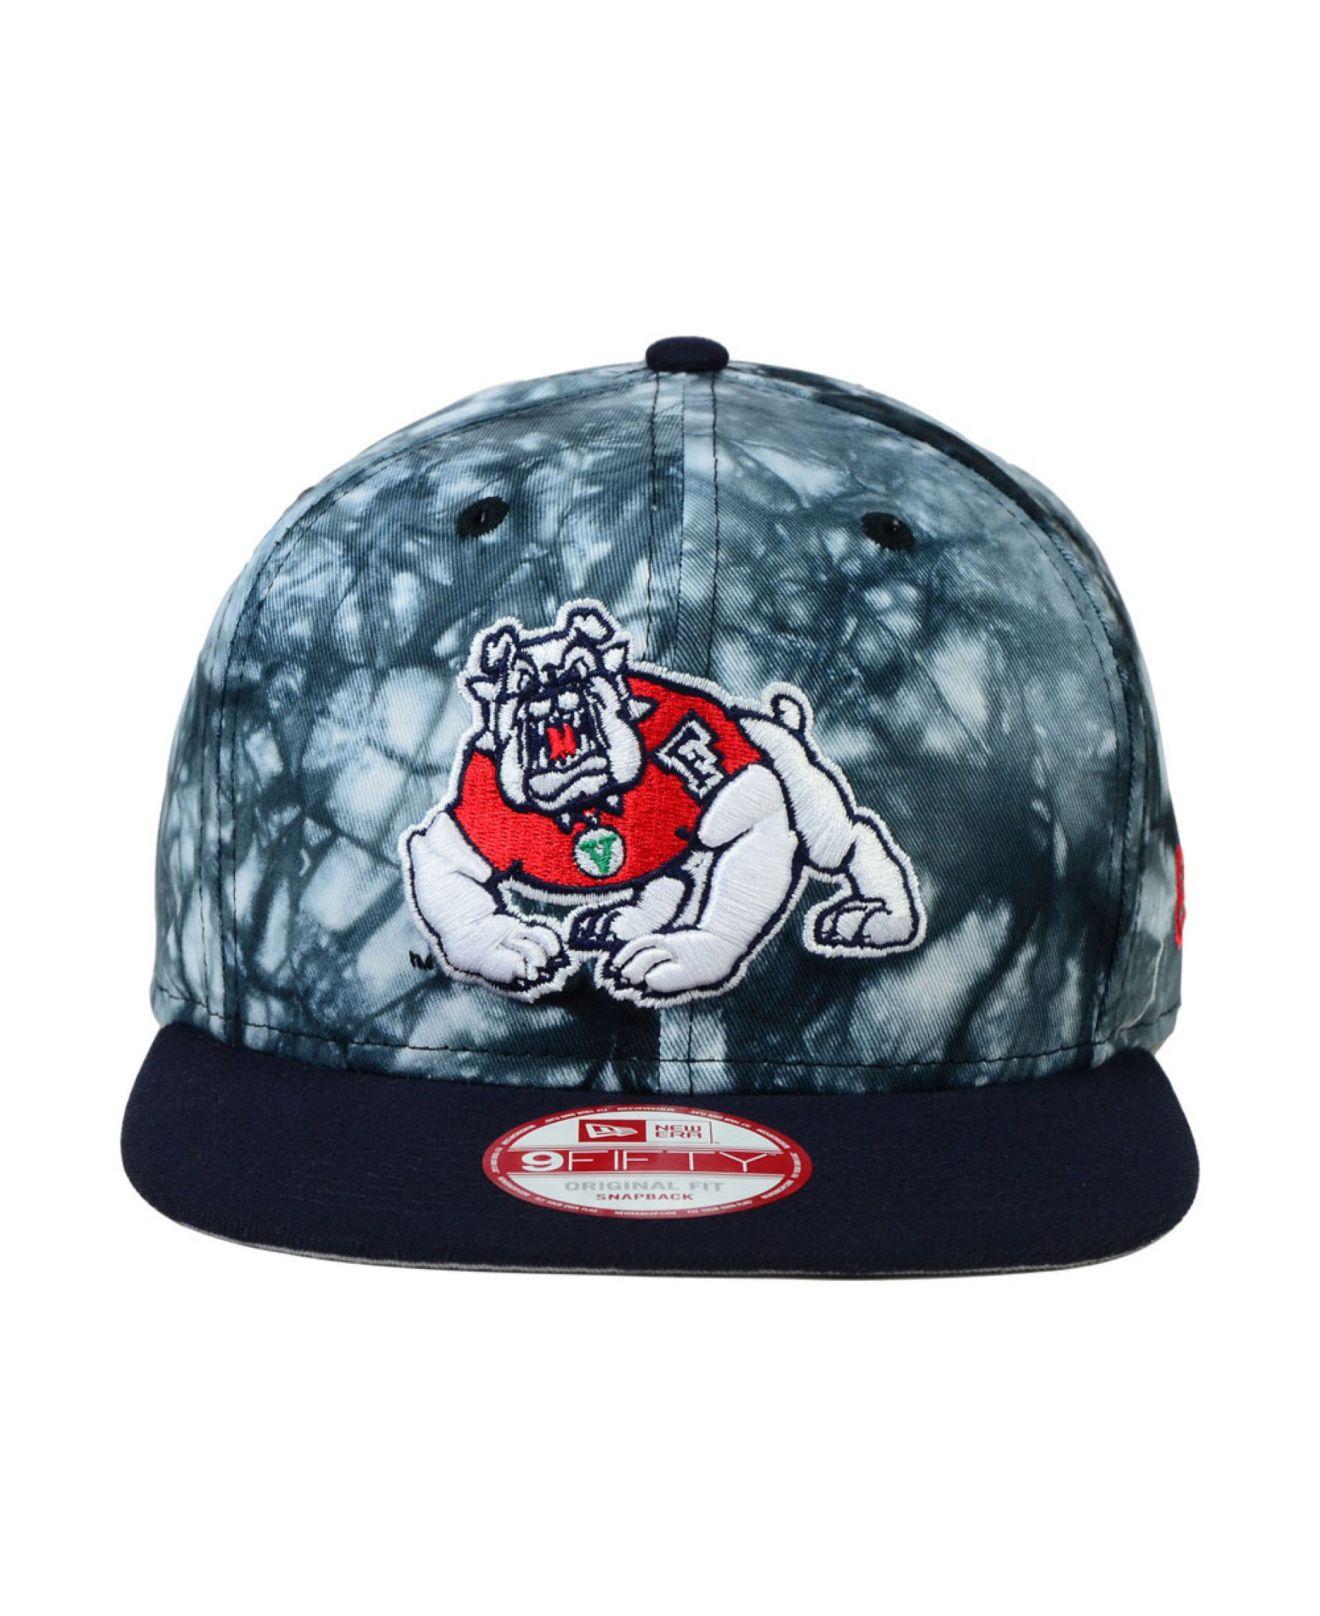 c3c133c98d2 Lyst - KTZ Fresno State Bulldogs Overcast 9fifty Snapback Cap in ...